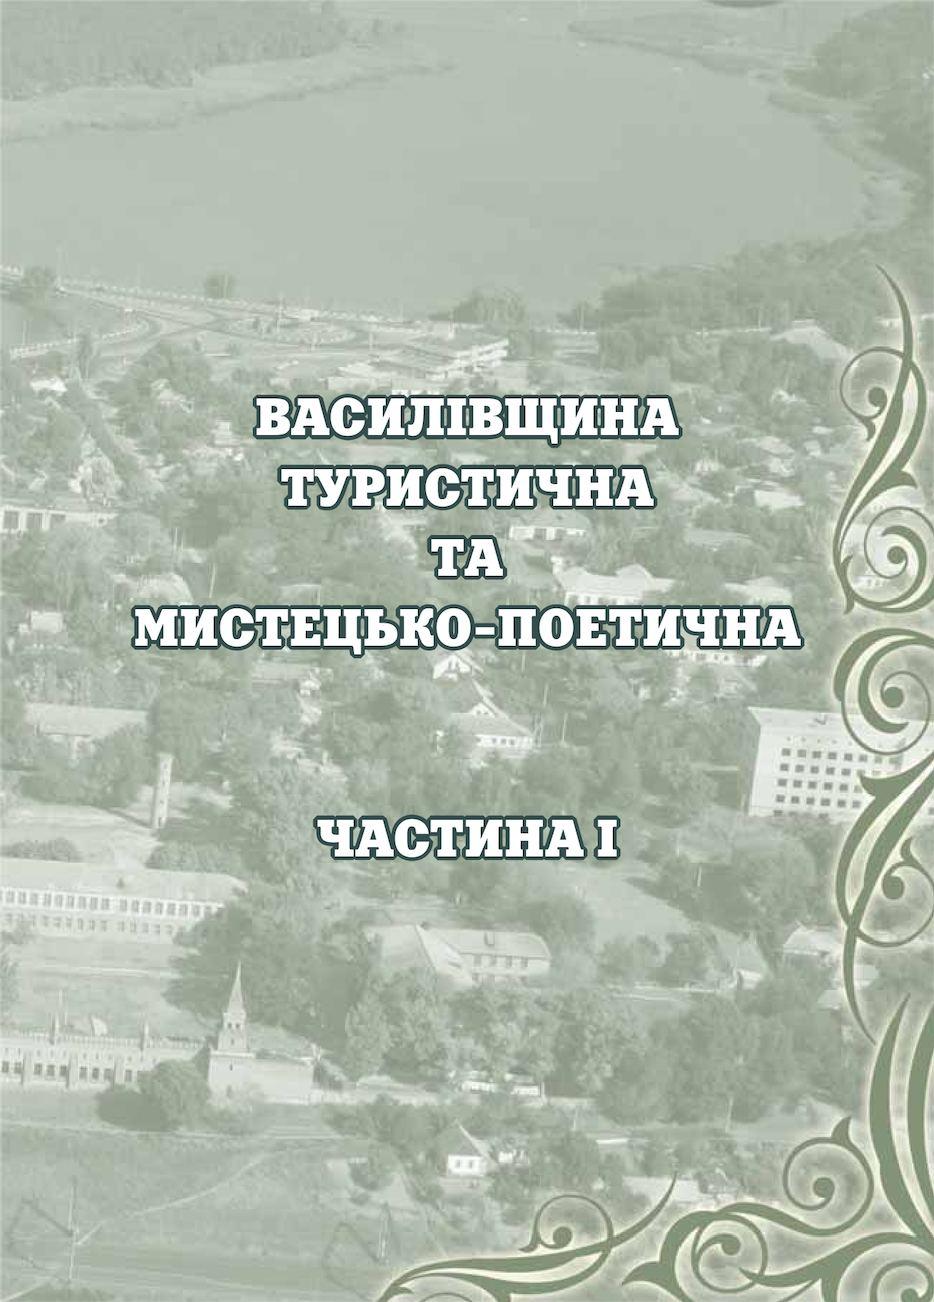 Calaméo - Василівка туристична та мистецько поетична 6b492e0ffe0c4